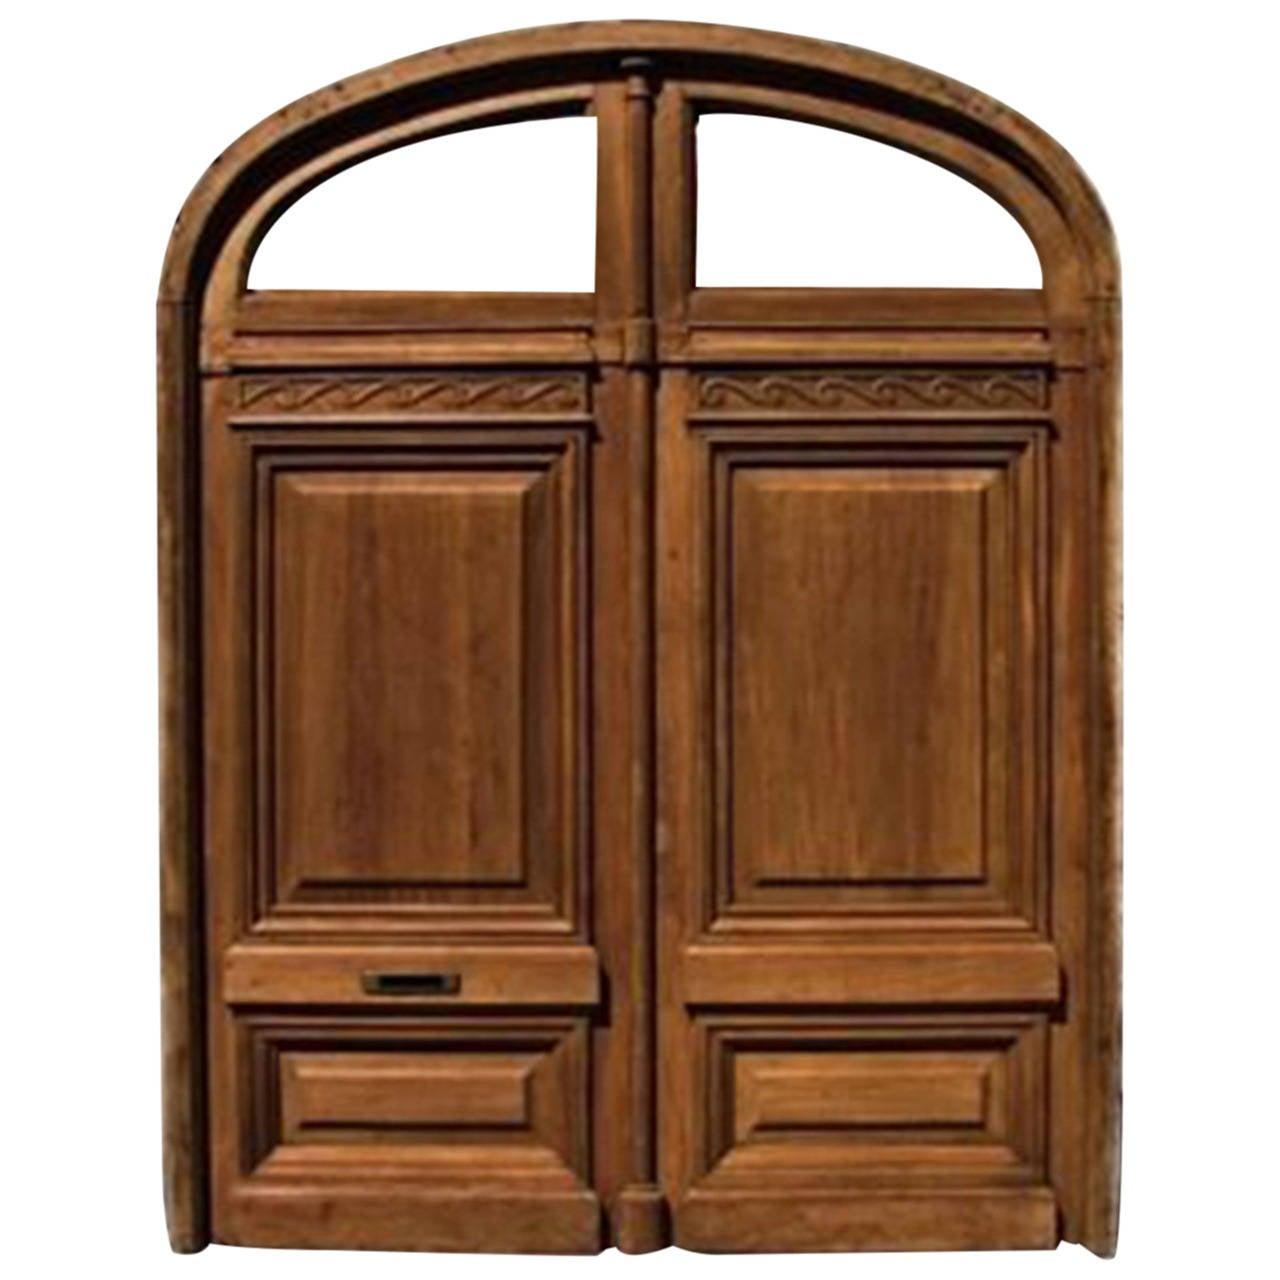 1280 #35190D Antique Double Front Door At 1stdibs save image Vintage Exterior Doors 41071280